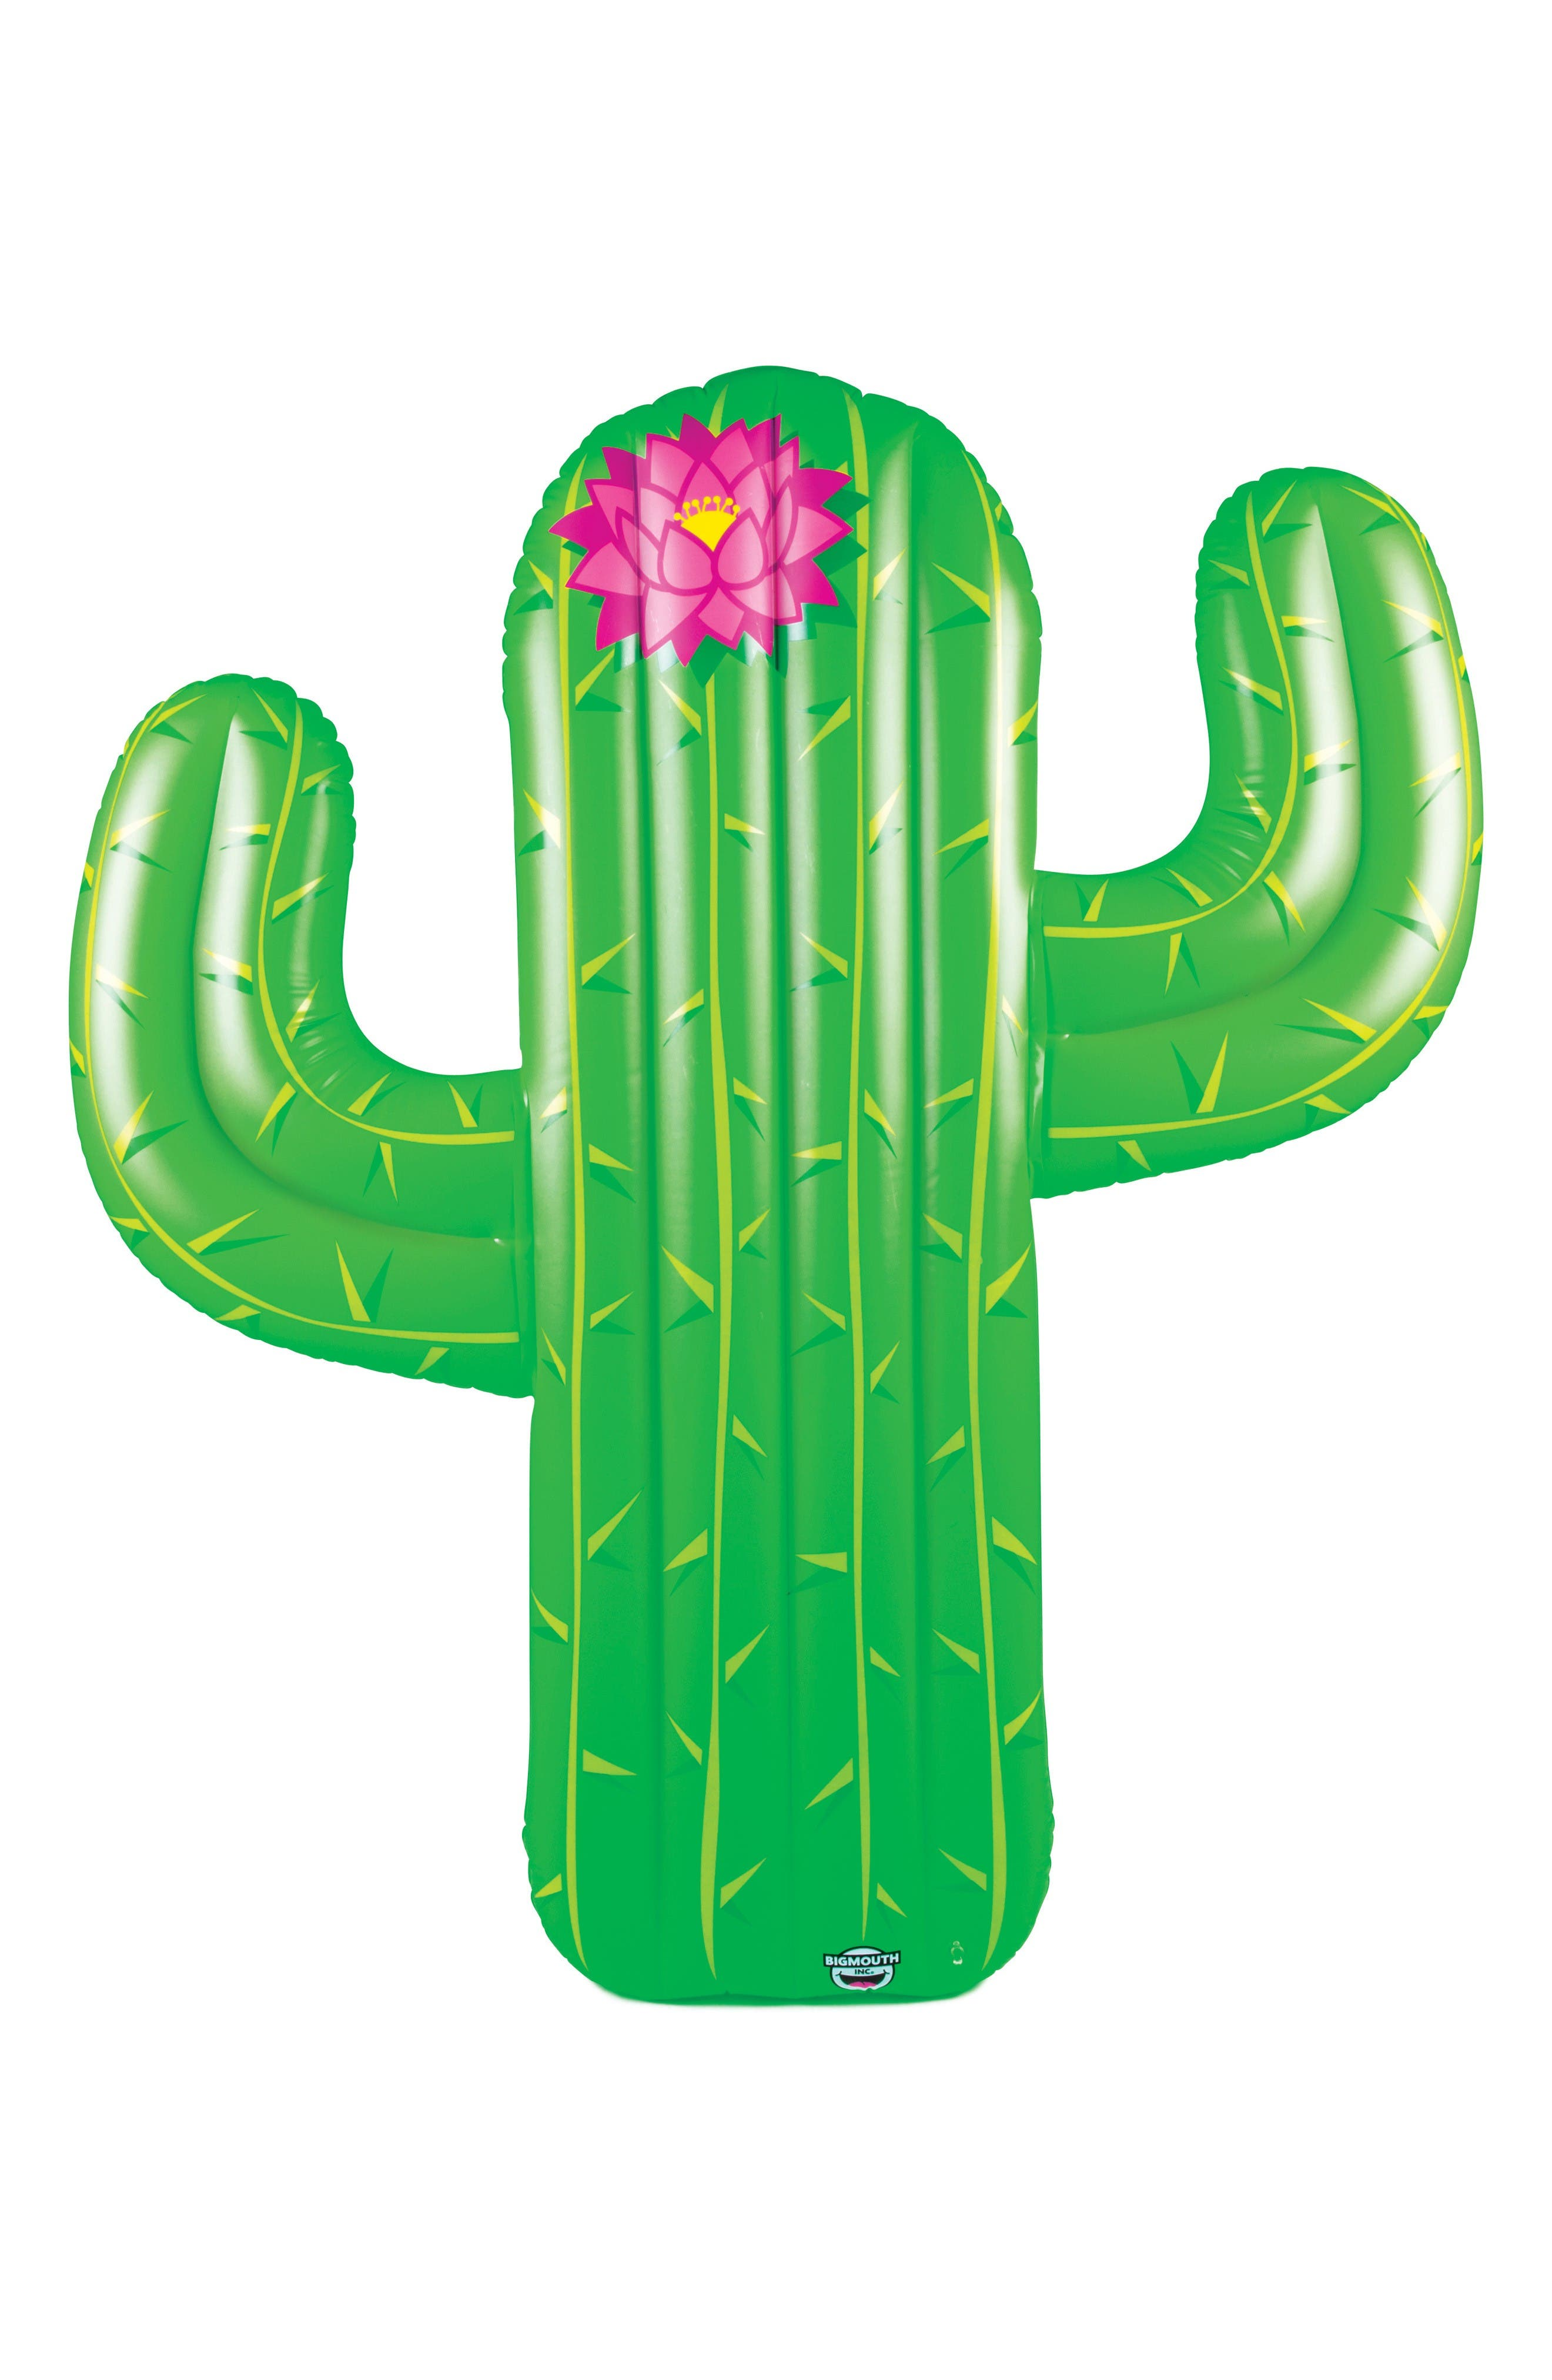 Alternate Image 1 Selected - BigMouth Inc. Cactus Pool Float